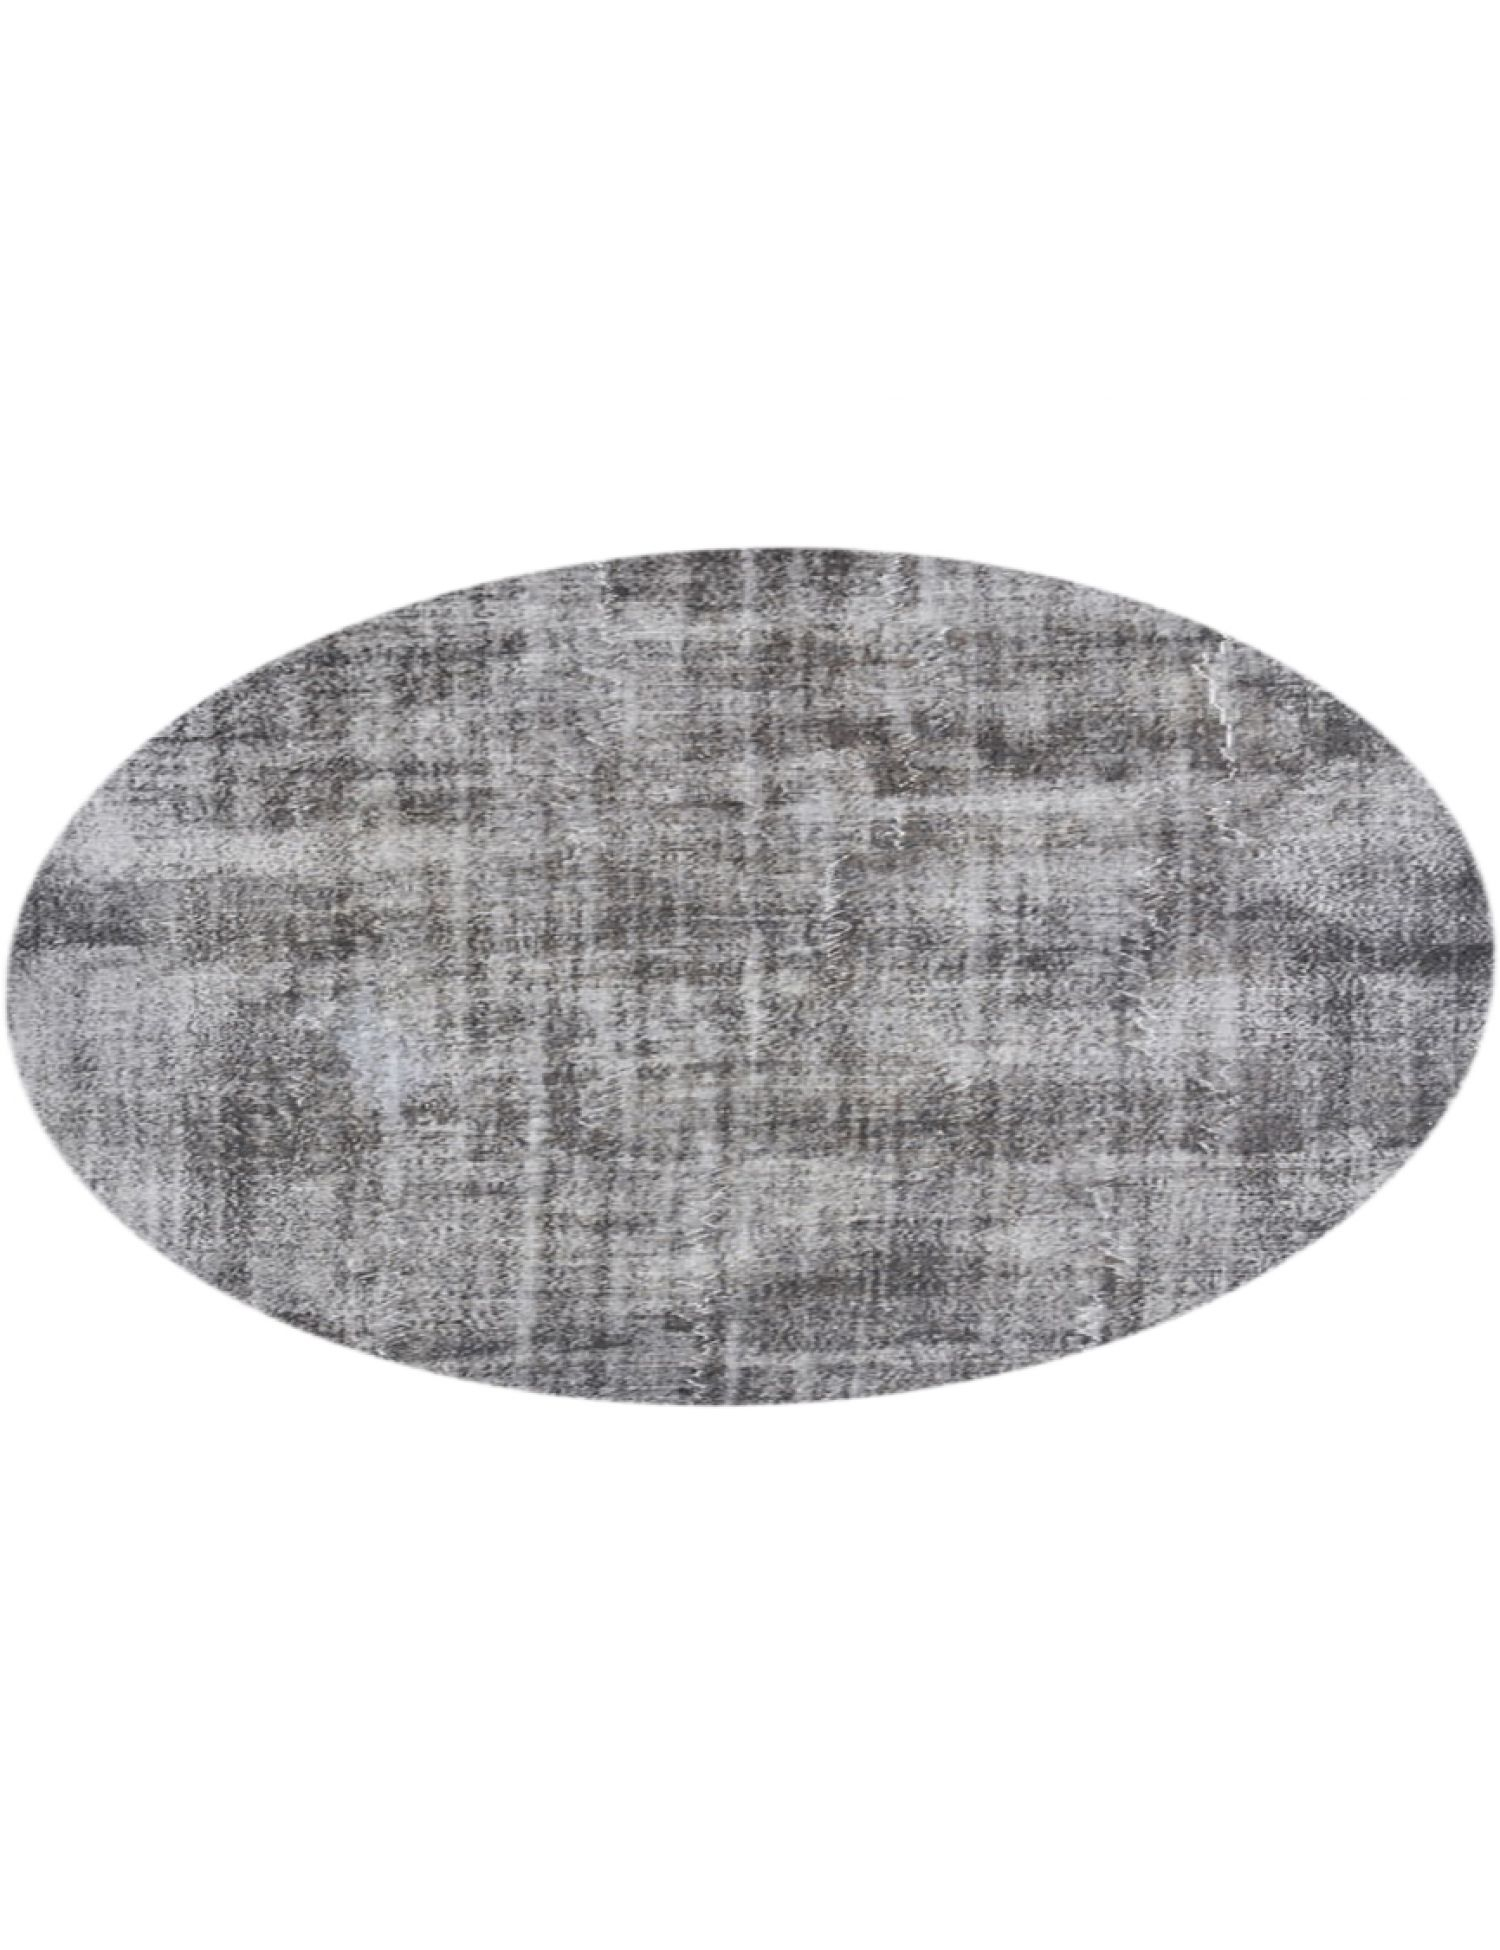 Tappeto Vintage  grigo <br/>274 x 274 cm